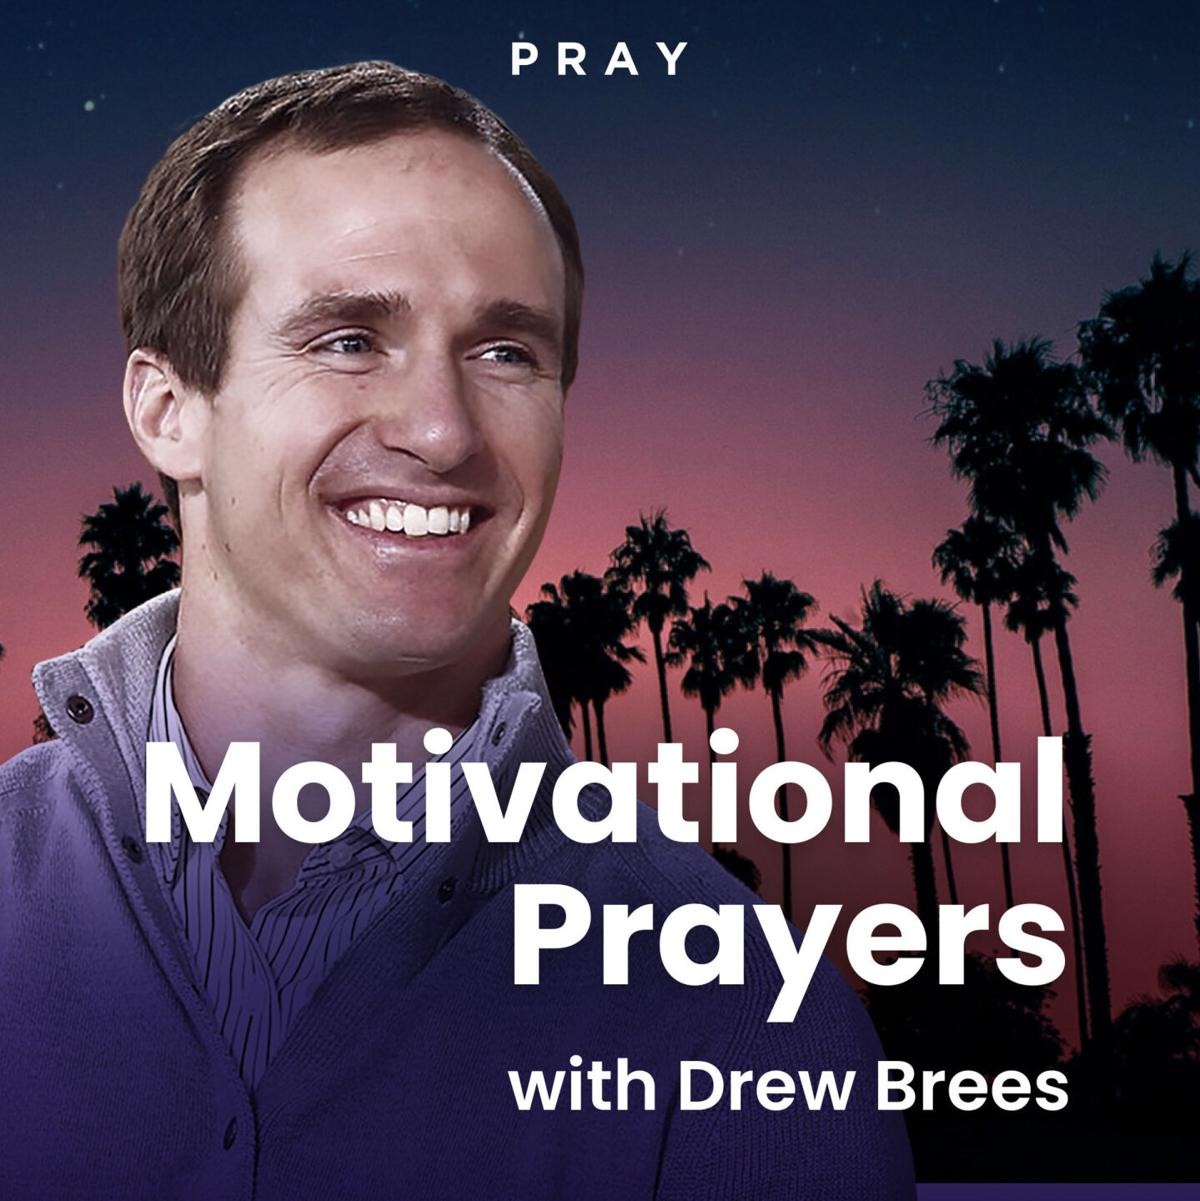 Pray.com Partners with Football Legend Drew Brees to Kick Off Season